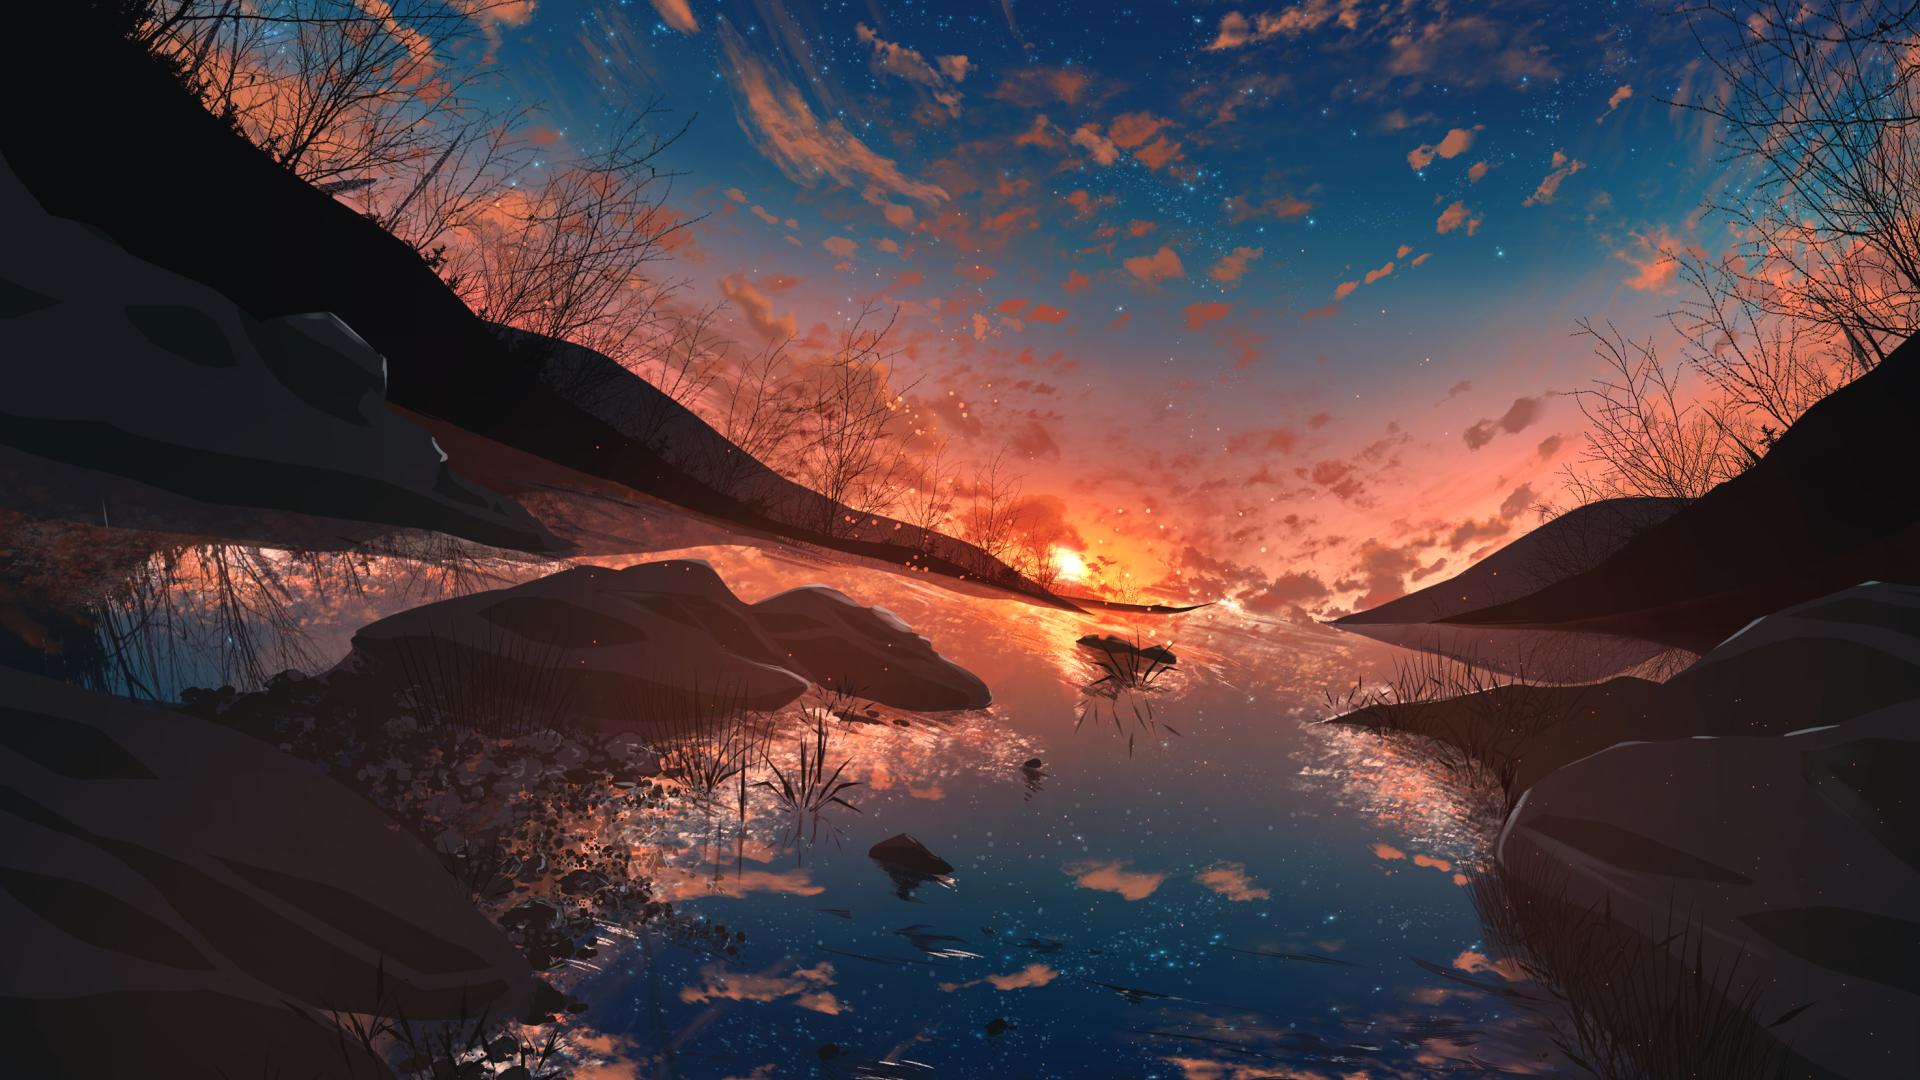 3840x2400 Anime Sunset Original Art UHD 4K 3840x2400 ...